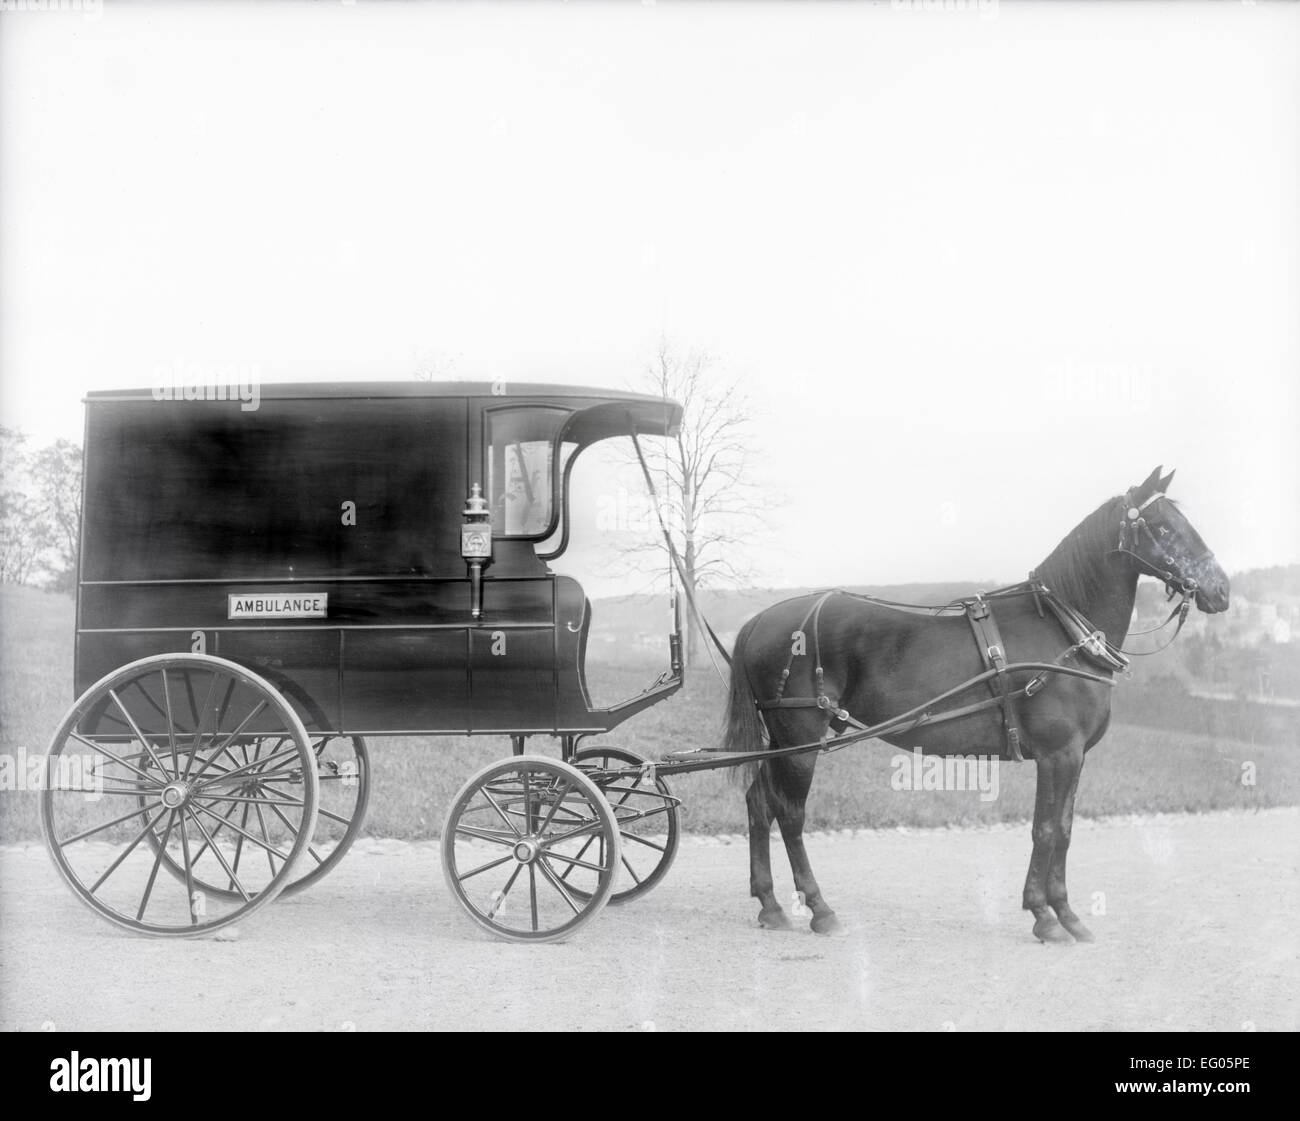 Antique c1900 photograph, horse-drawn ambulance wagon